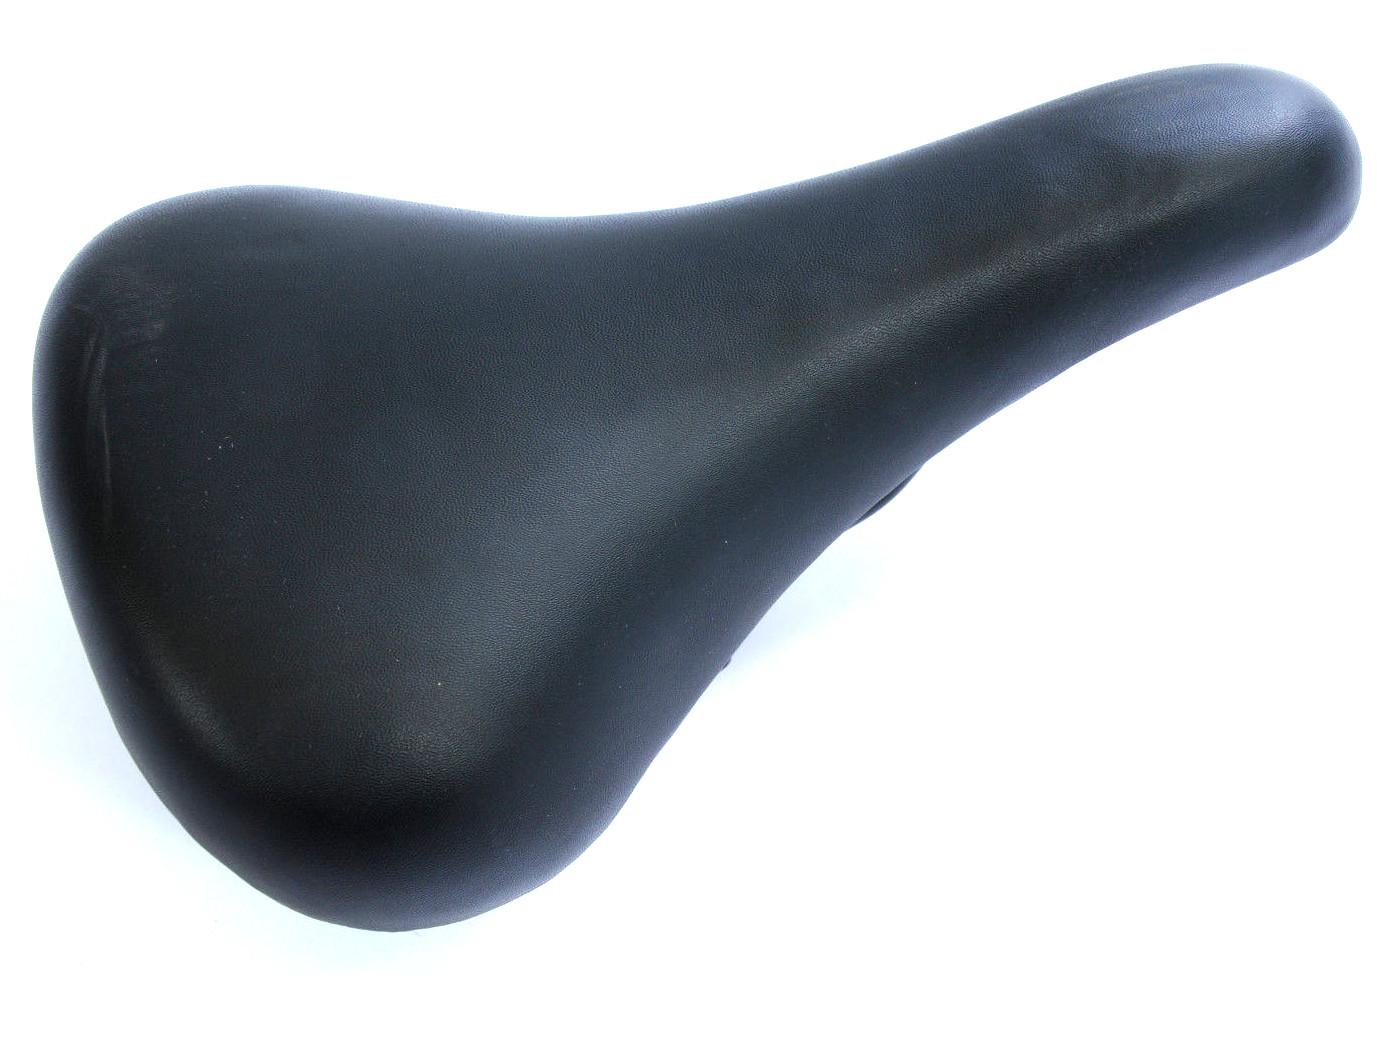 Basic Black Soft Seat Covered Adult Saddle & Clamp